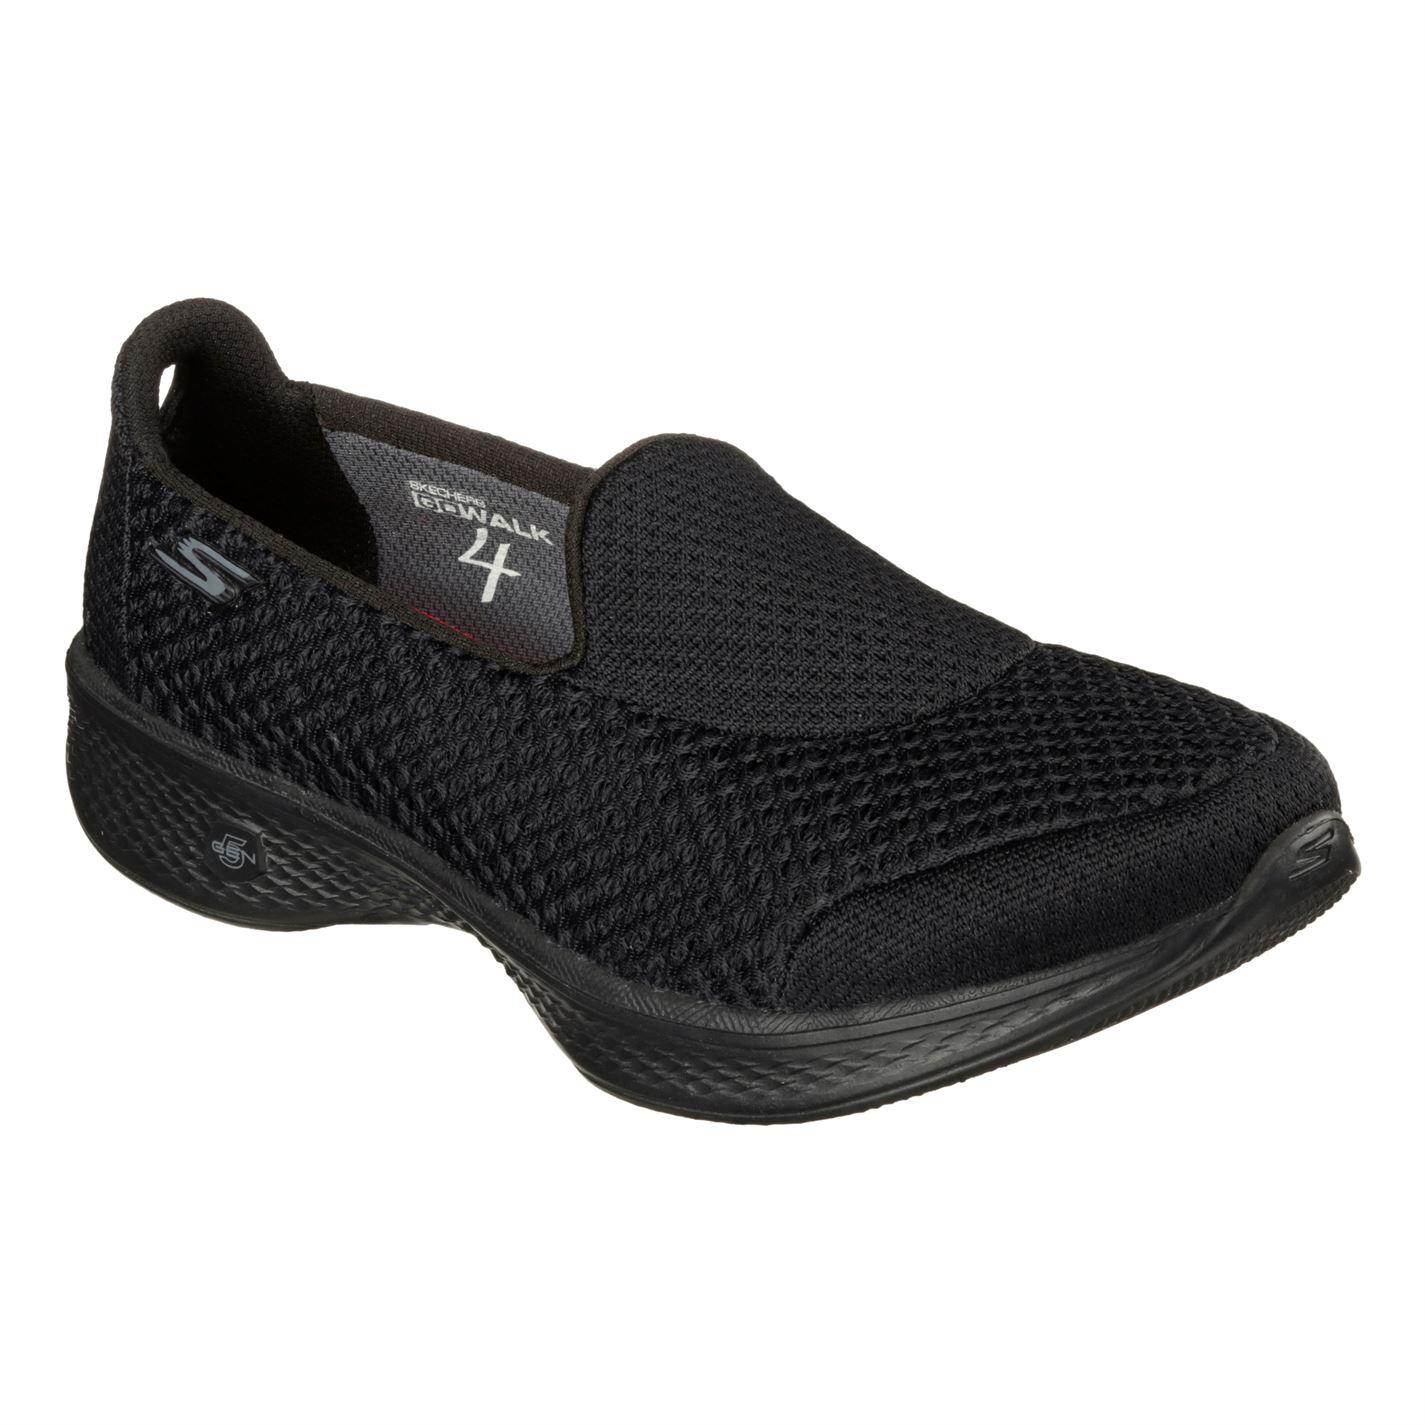 boty Skechers Go Walk 4 K Ld00 Black - Glami.cz 9cb31e4a7b0